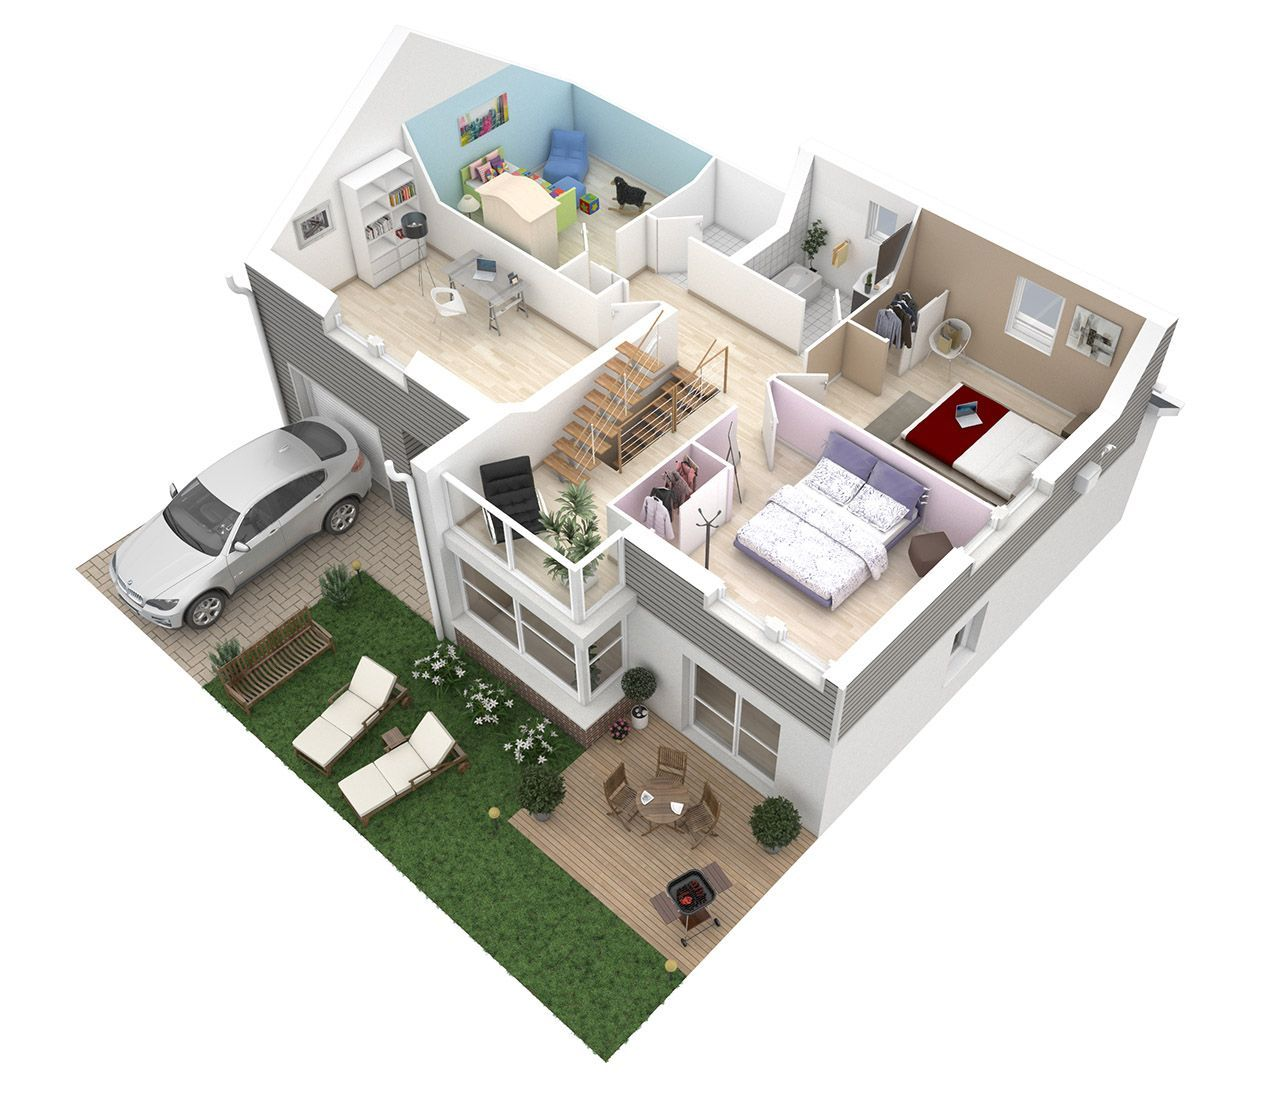 Plan Maison 60m2 Etage Plan Maison 3d Plan Maison Etage Plan Maison 120m2